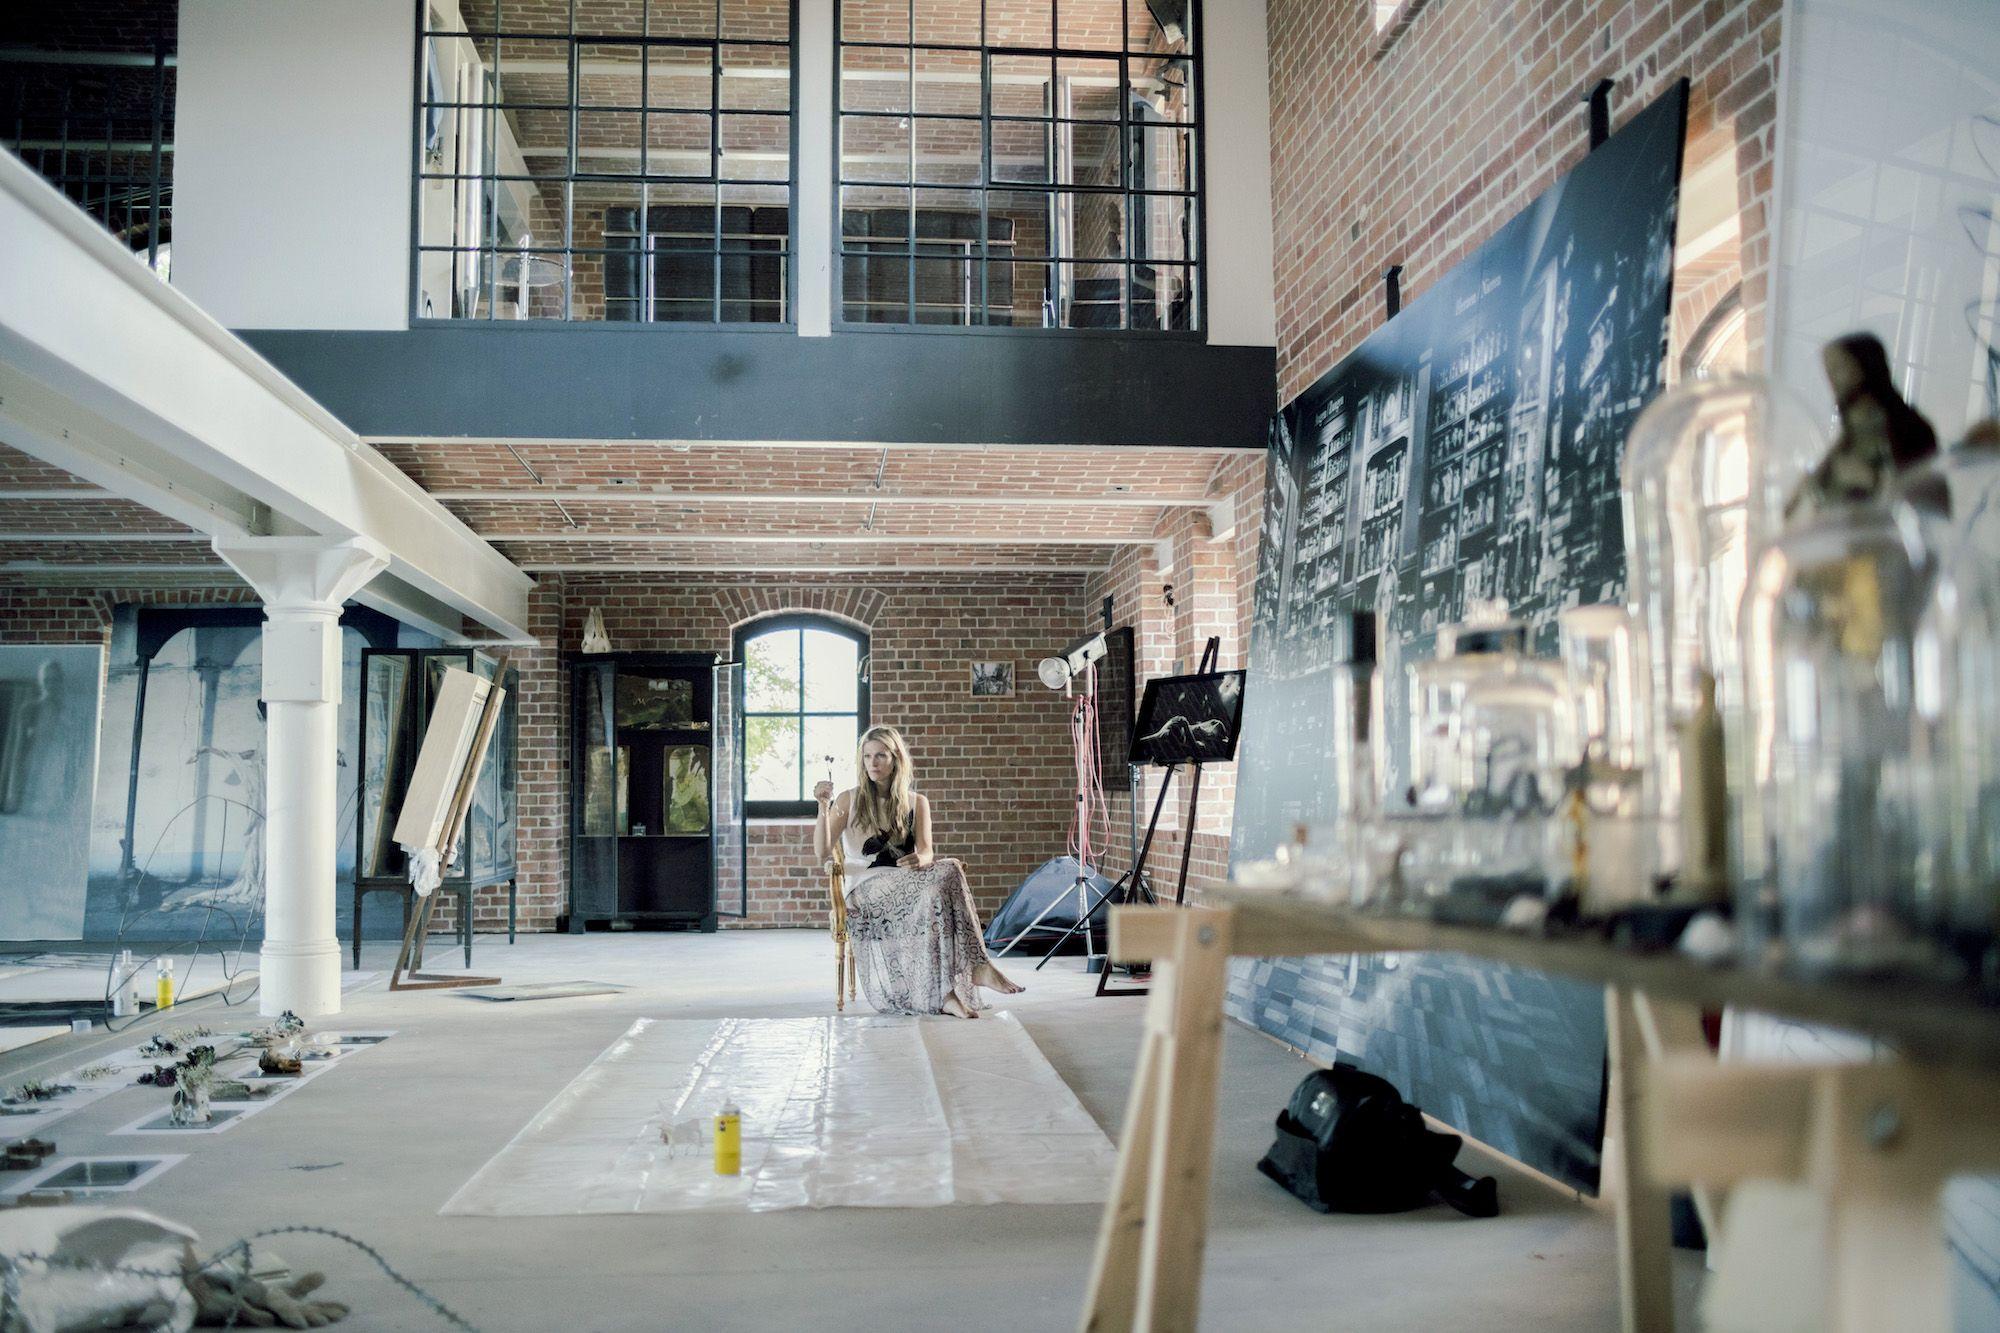 Artist in Residence MIA FLORENTINE WEISS